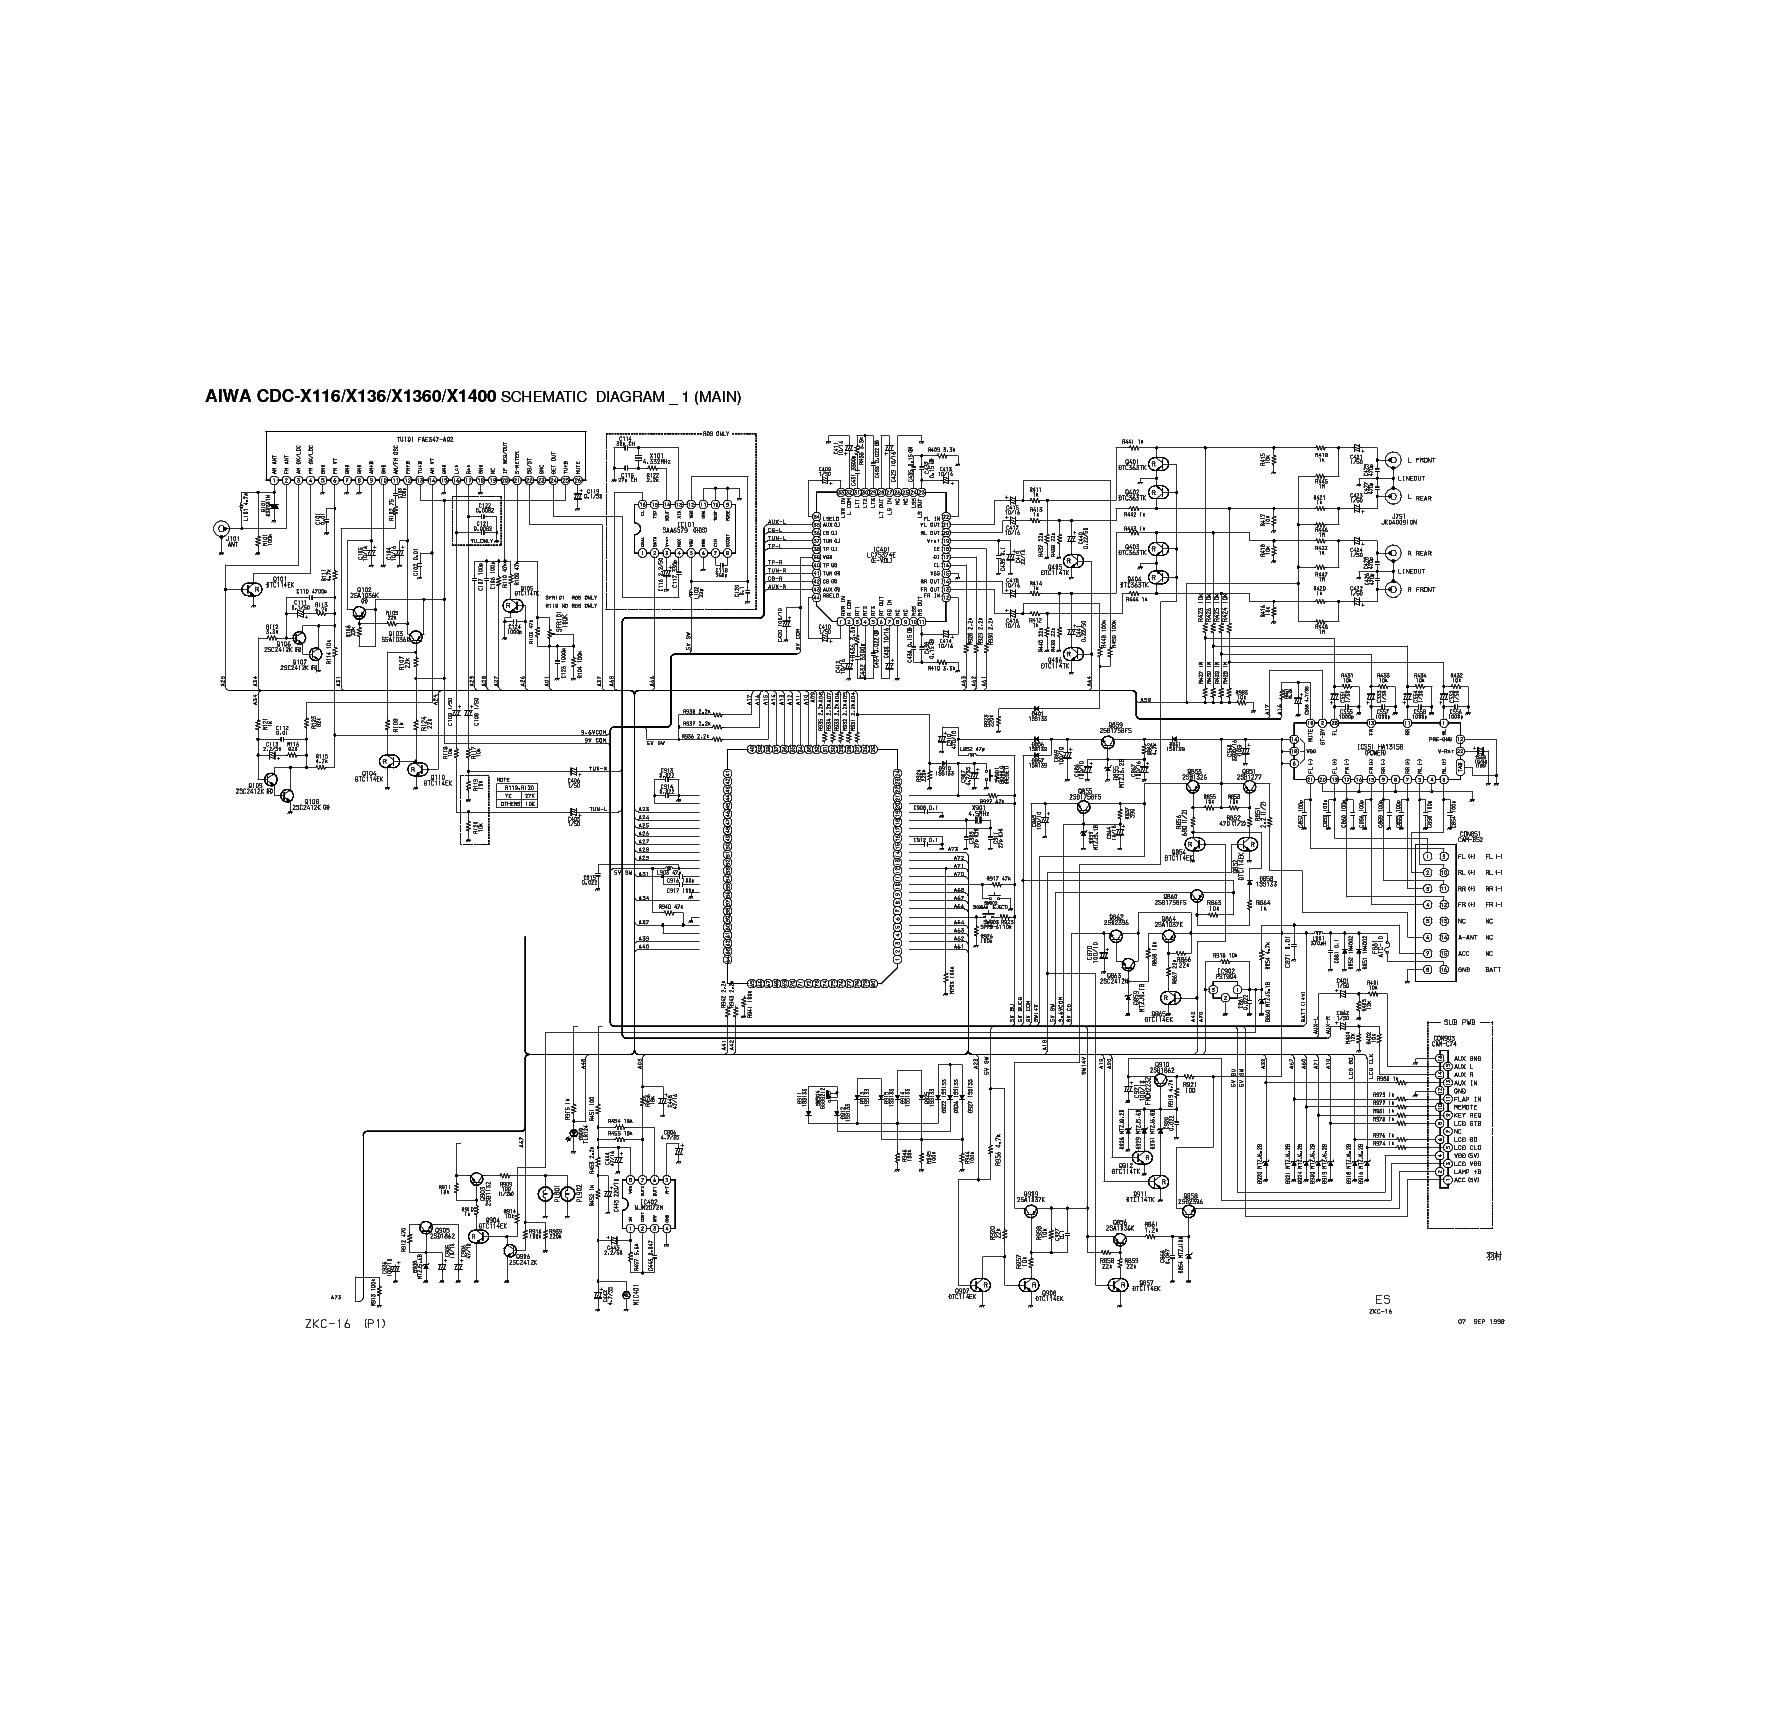 AIWA-CDC-X116-136 1360 1400 SCH service manual (1st page)